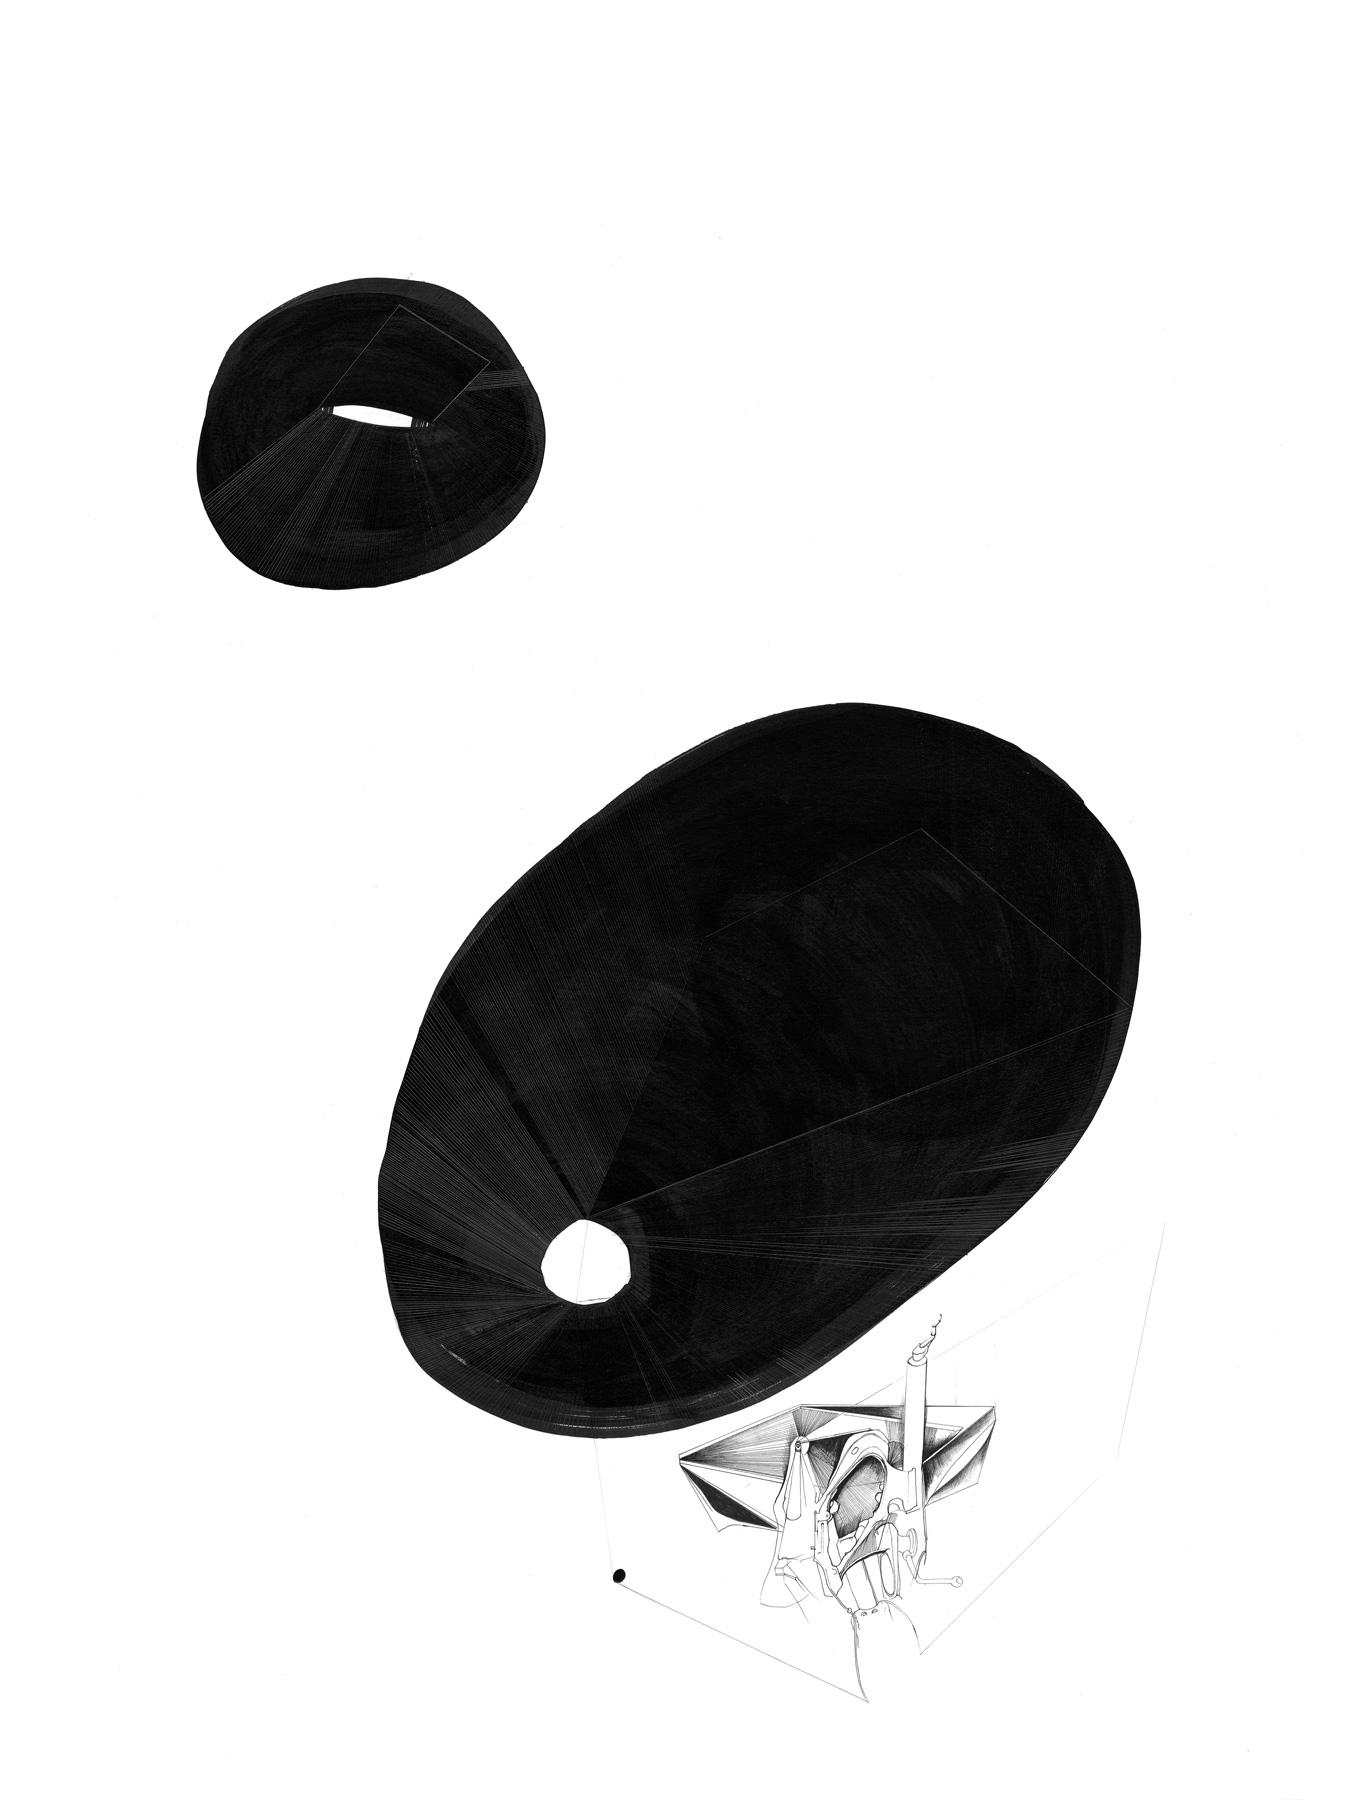 Nina Annabelle Märkl | Balancing the Whimsical 11 | Ink on paper | 60 x 48 cm | 2016